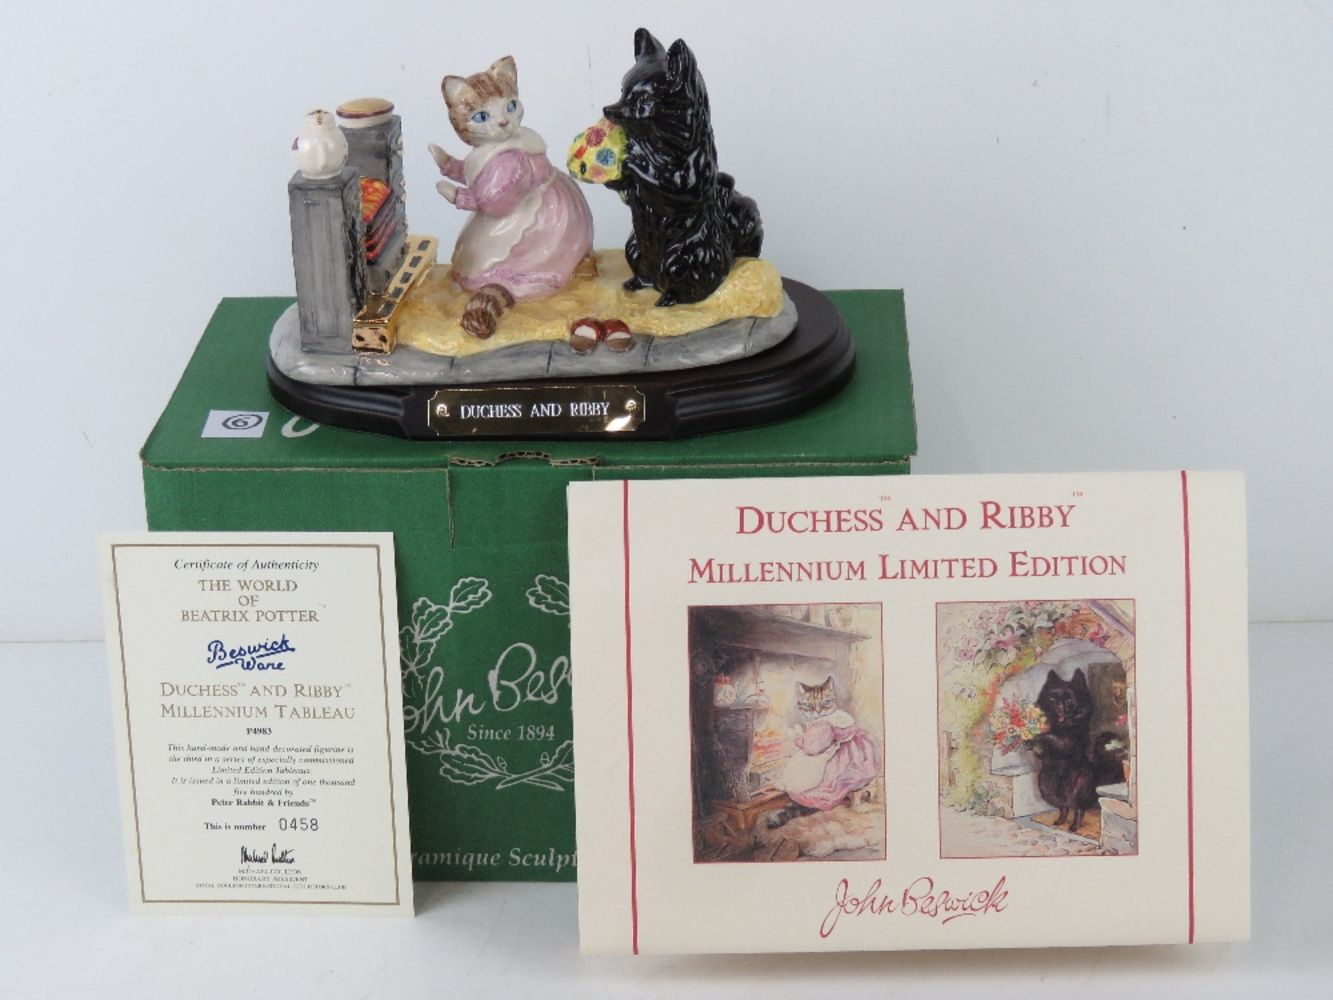 Timed Online Only Auction of Beatrix Potter Ceramics; Beswick, Royal Doulton, Royal Albert etc